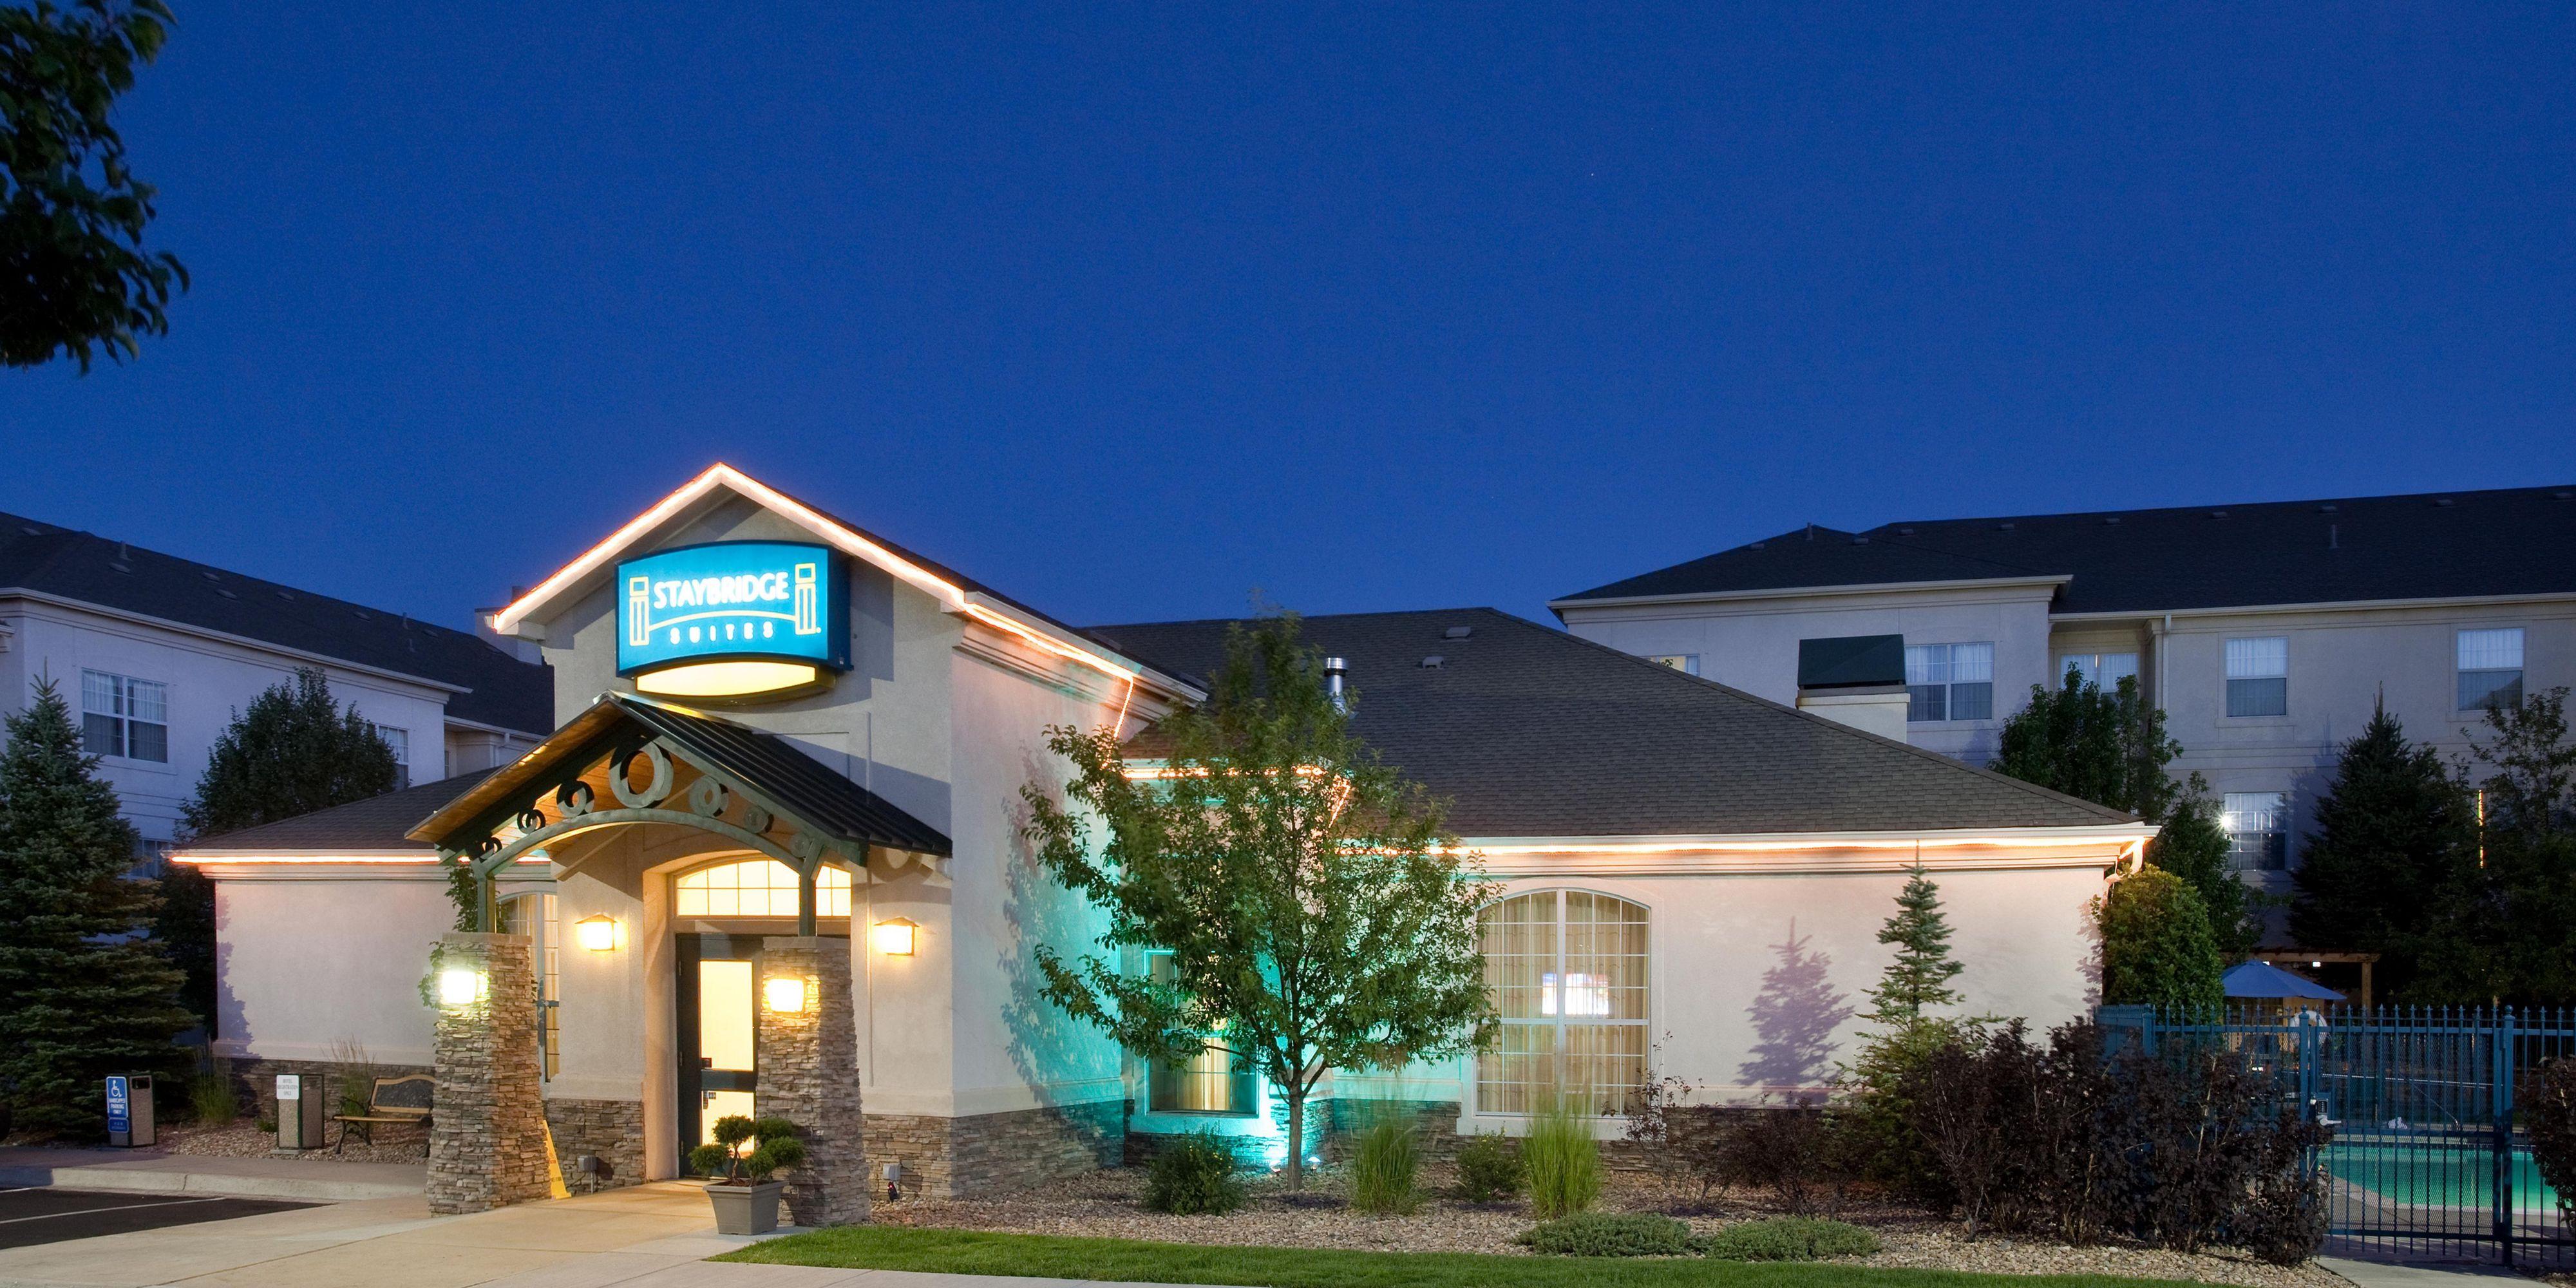 Staybridge Suites Denver Tech Center image 0